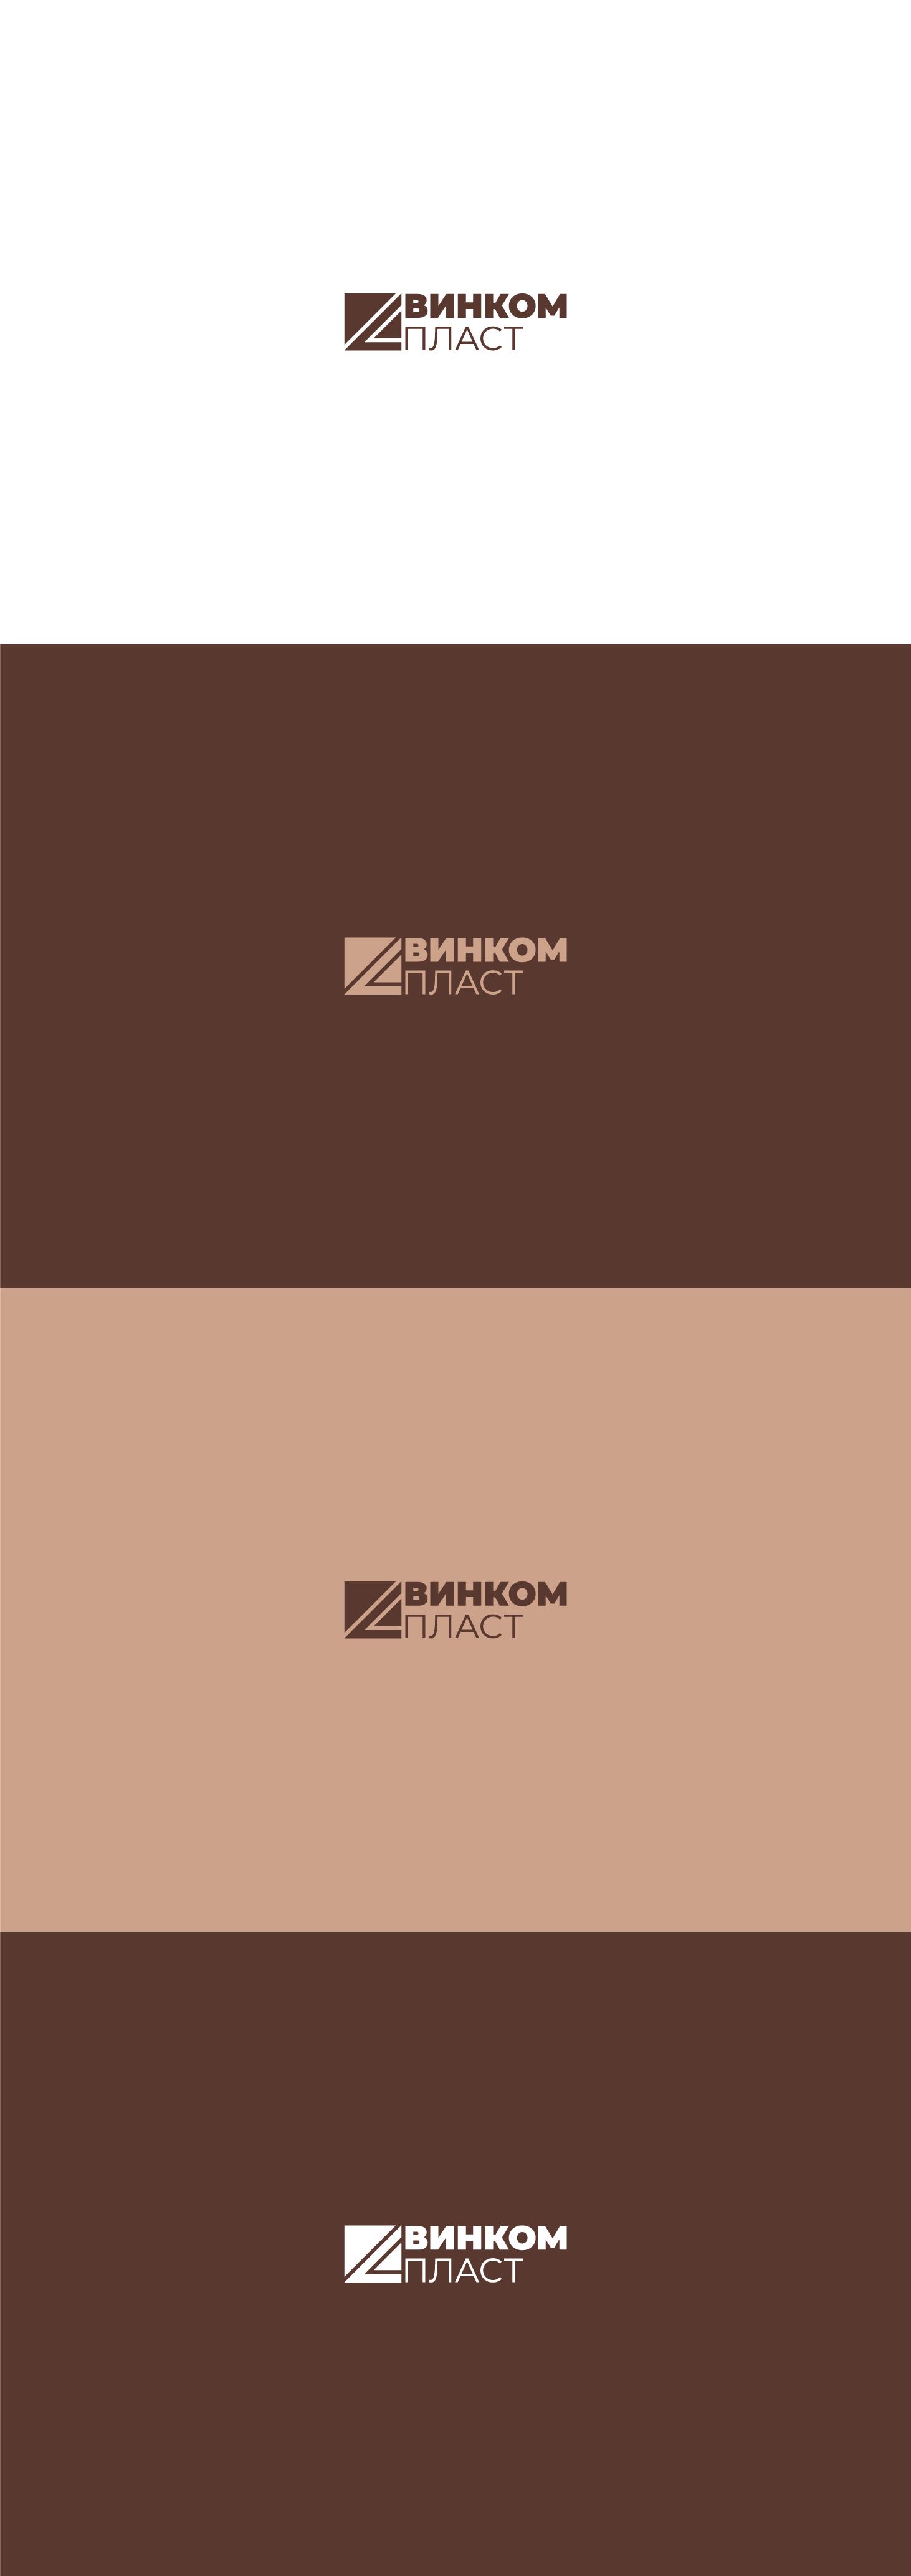 Логотип, фавикон и визитка для компании Винком Пласт  фото f_2335c379138c96b2.png